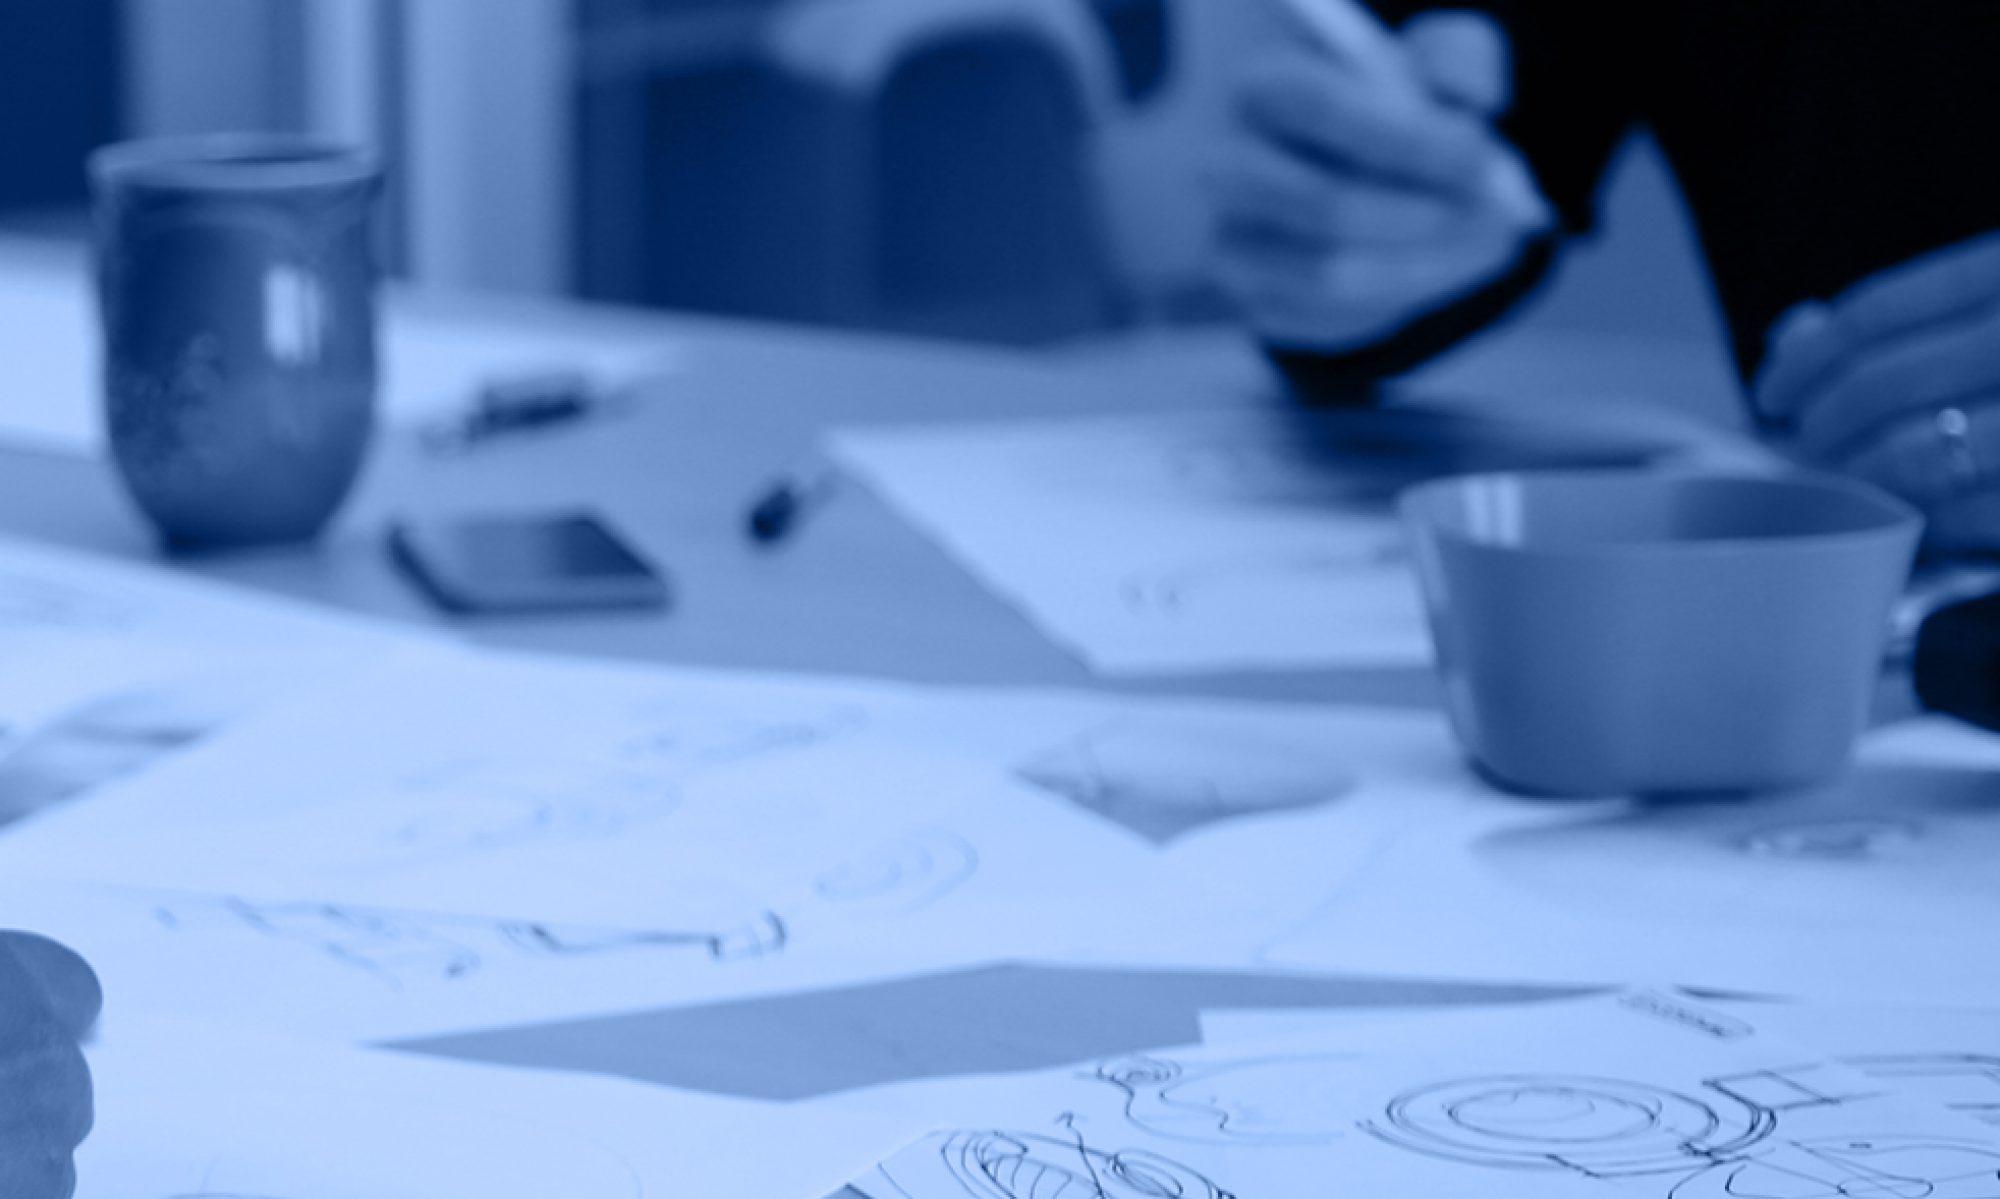 Design & Documentation